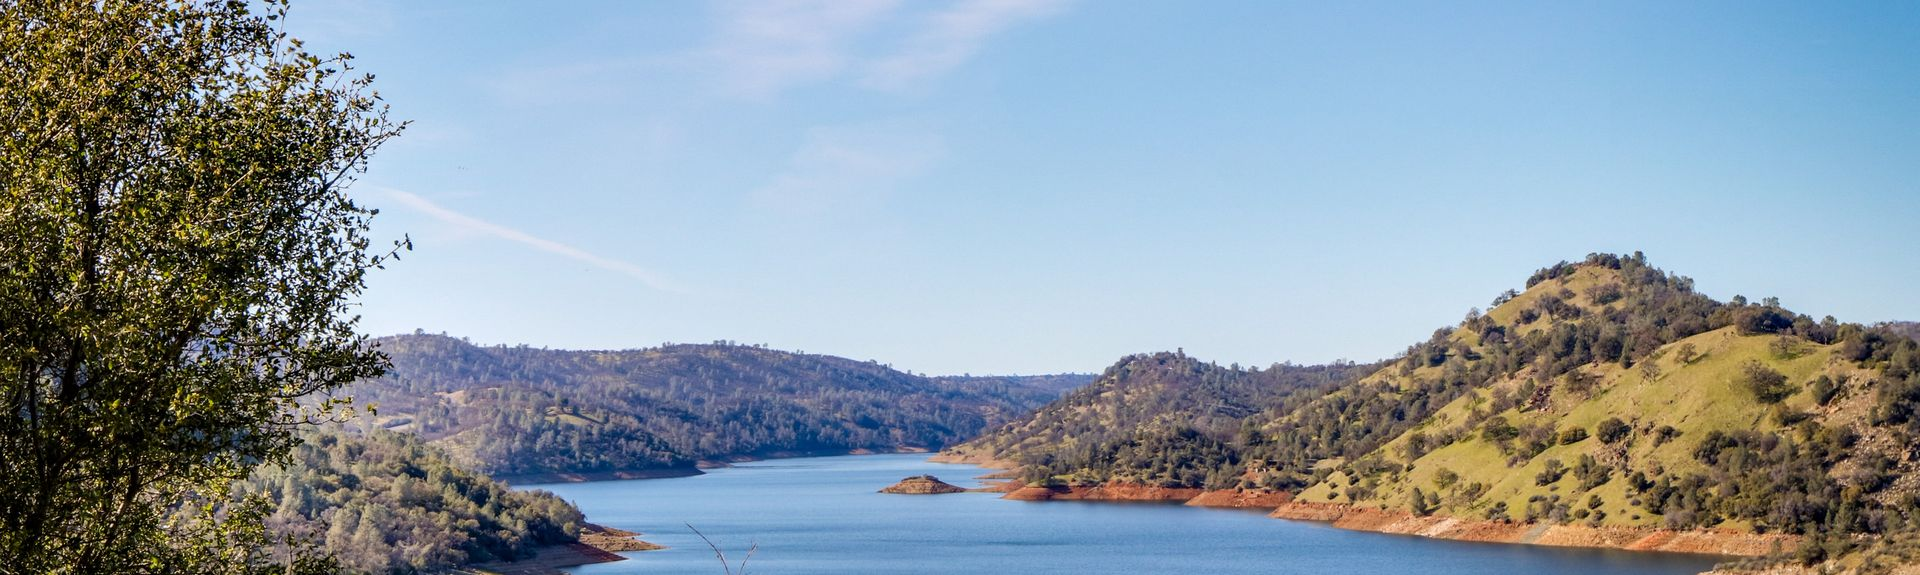 Pine Mountain Lake, US Vacation Rentals: cabin rentals ...